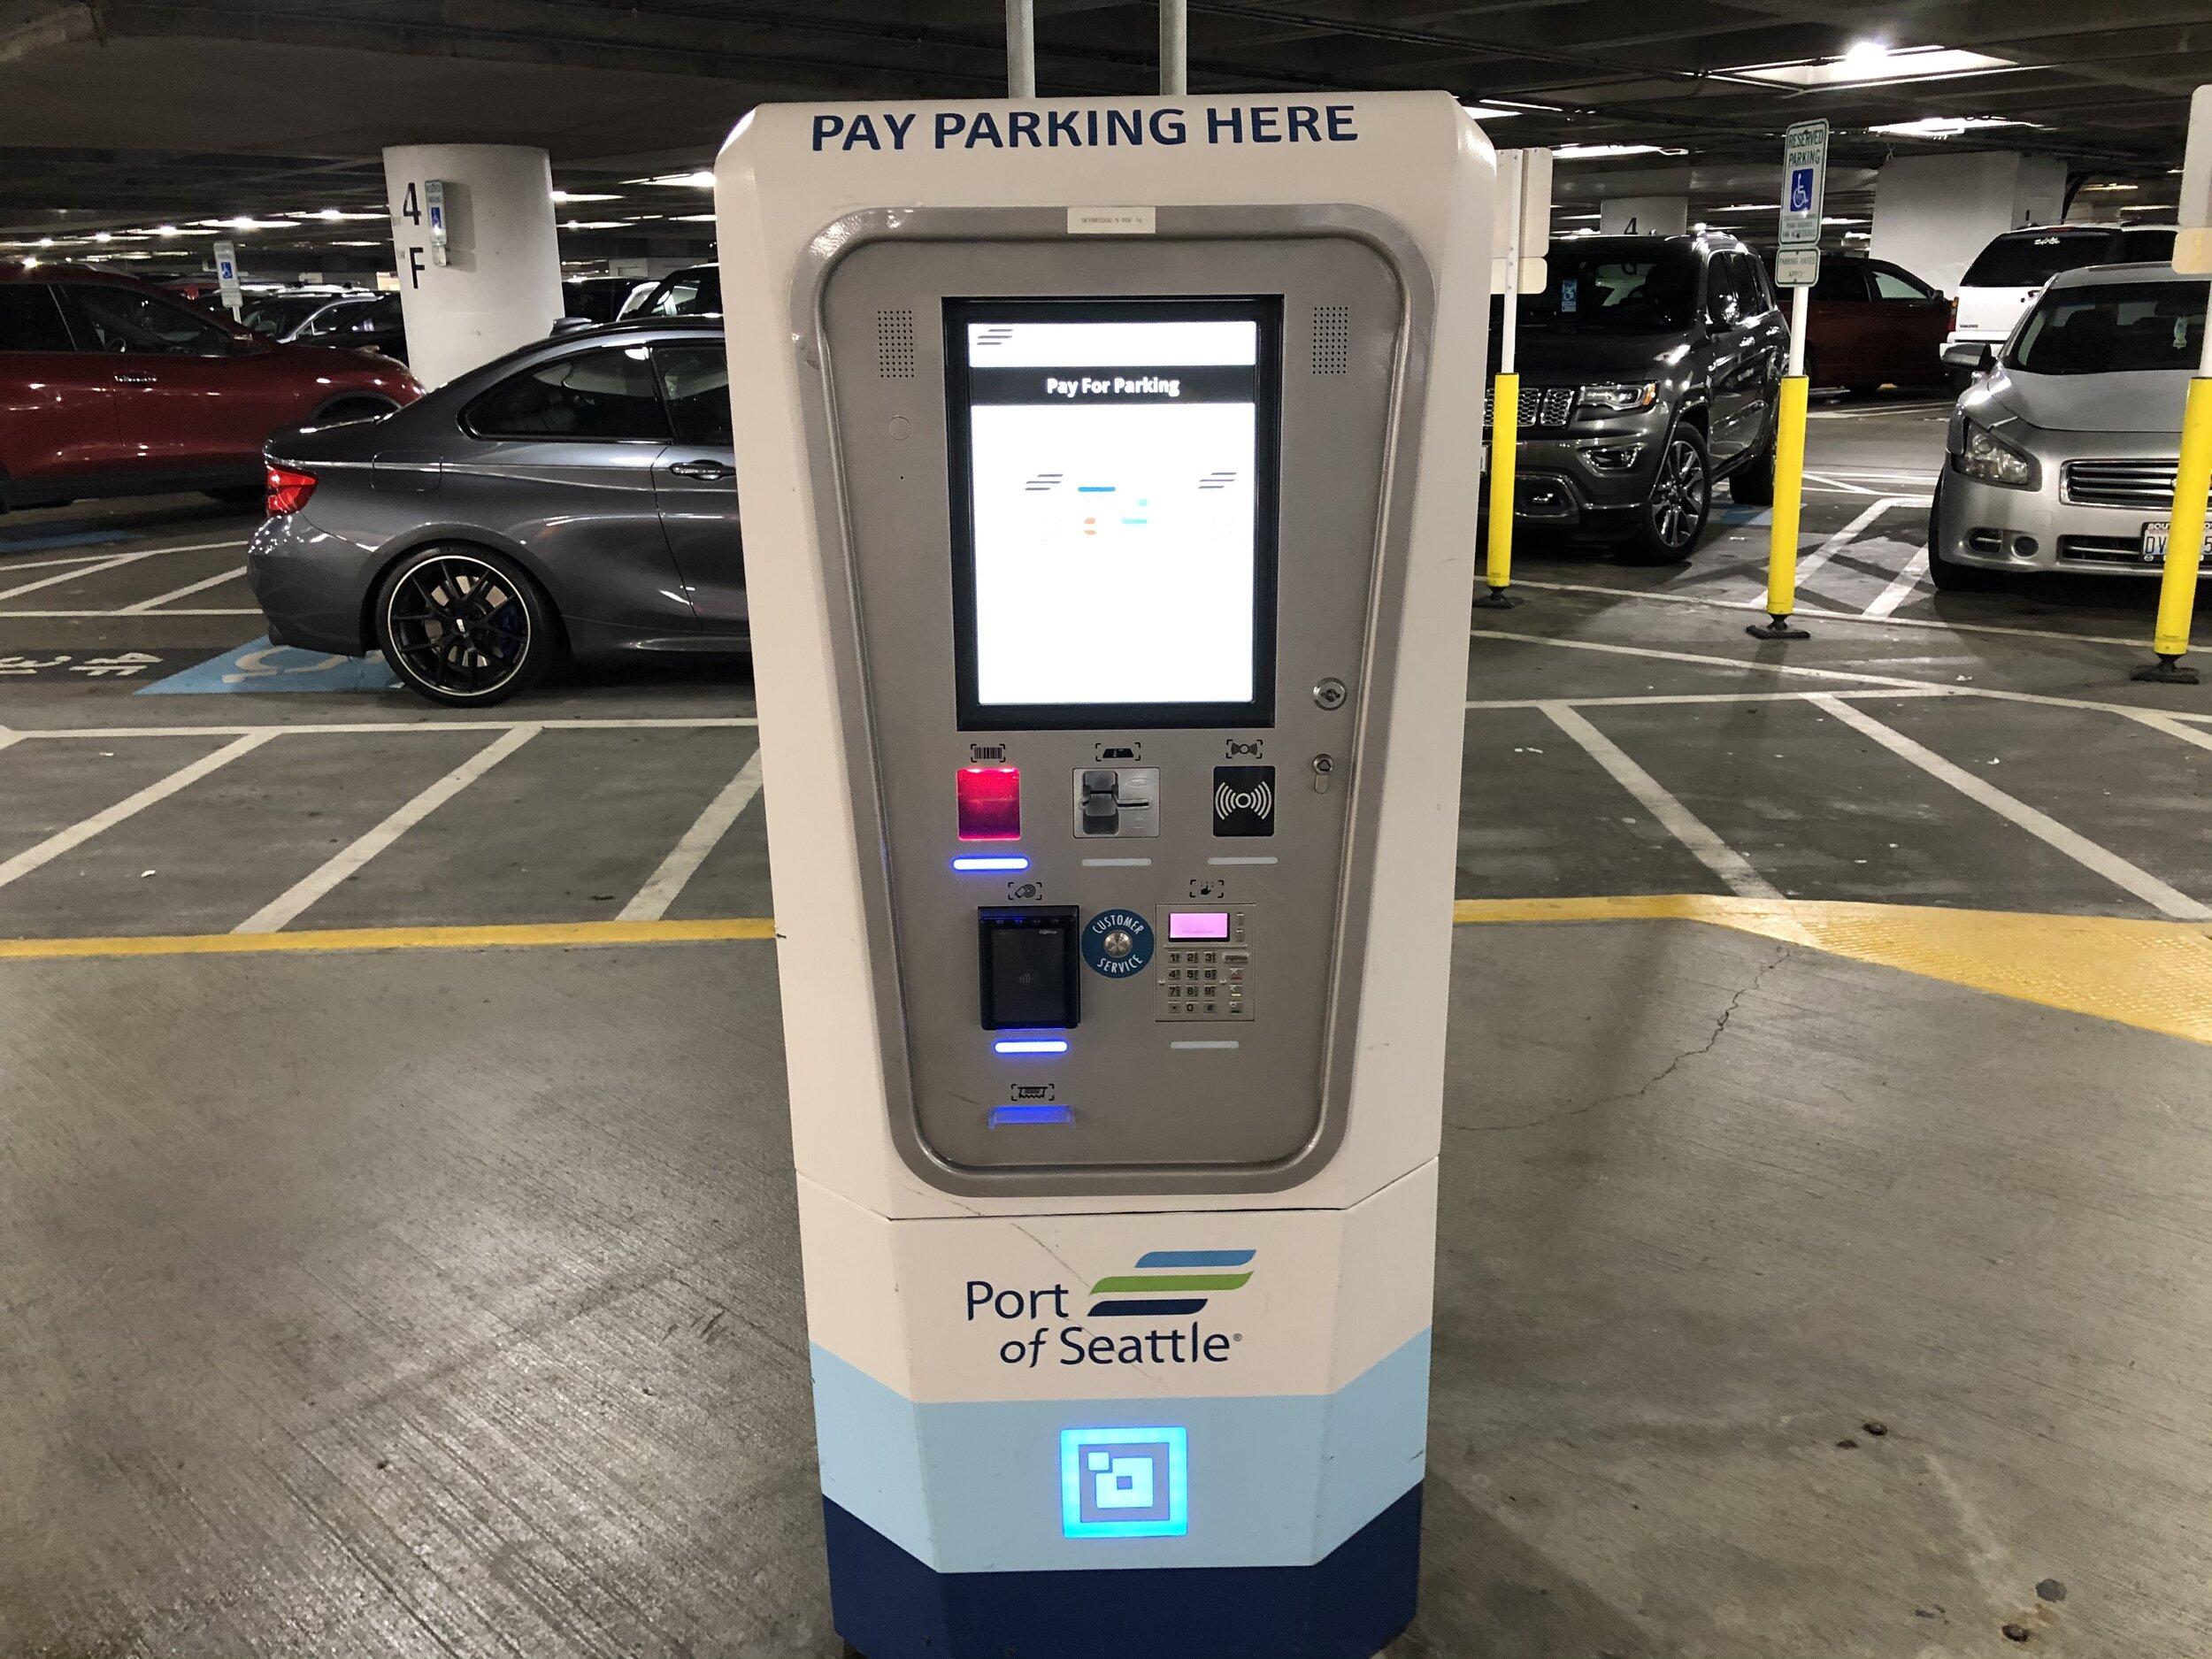 A self-service kiosk in a parking garage.